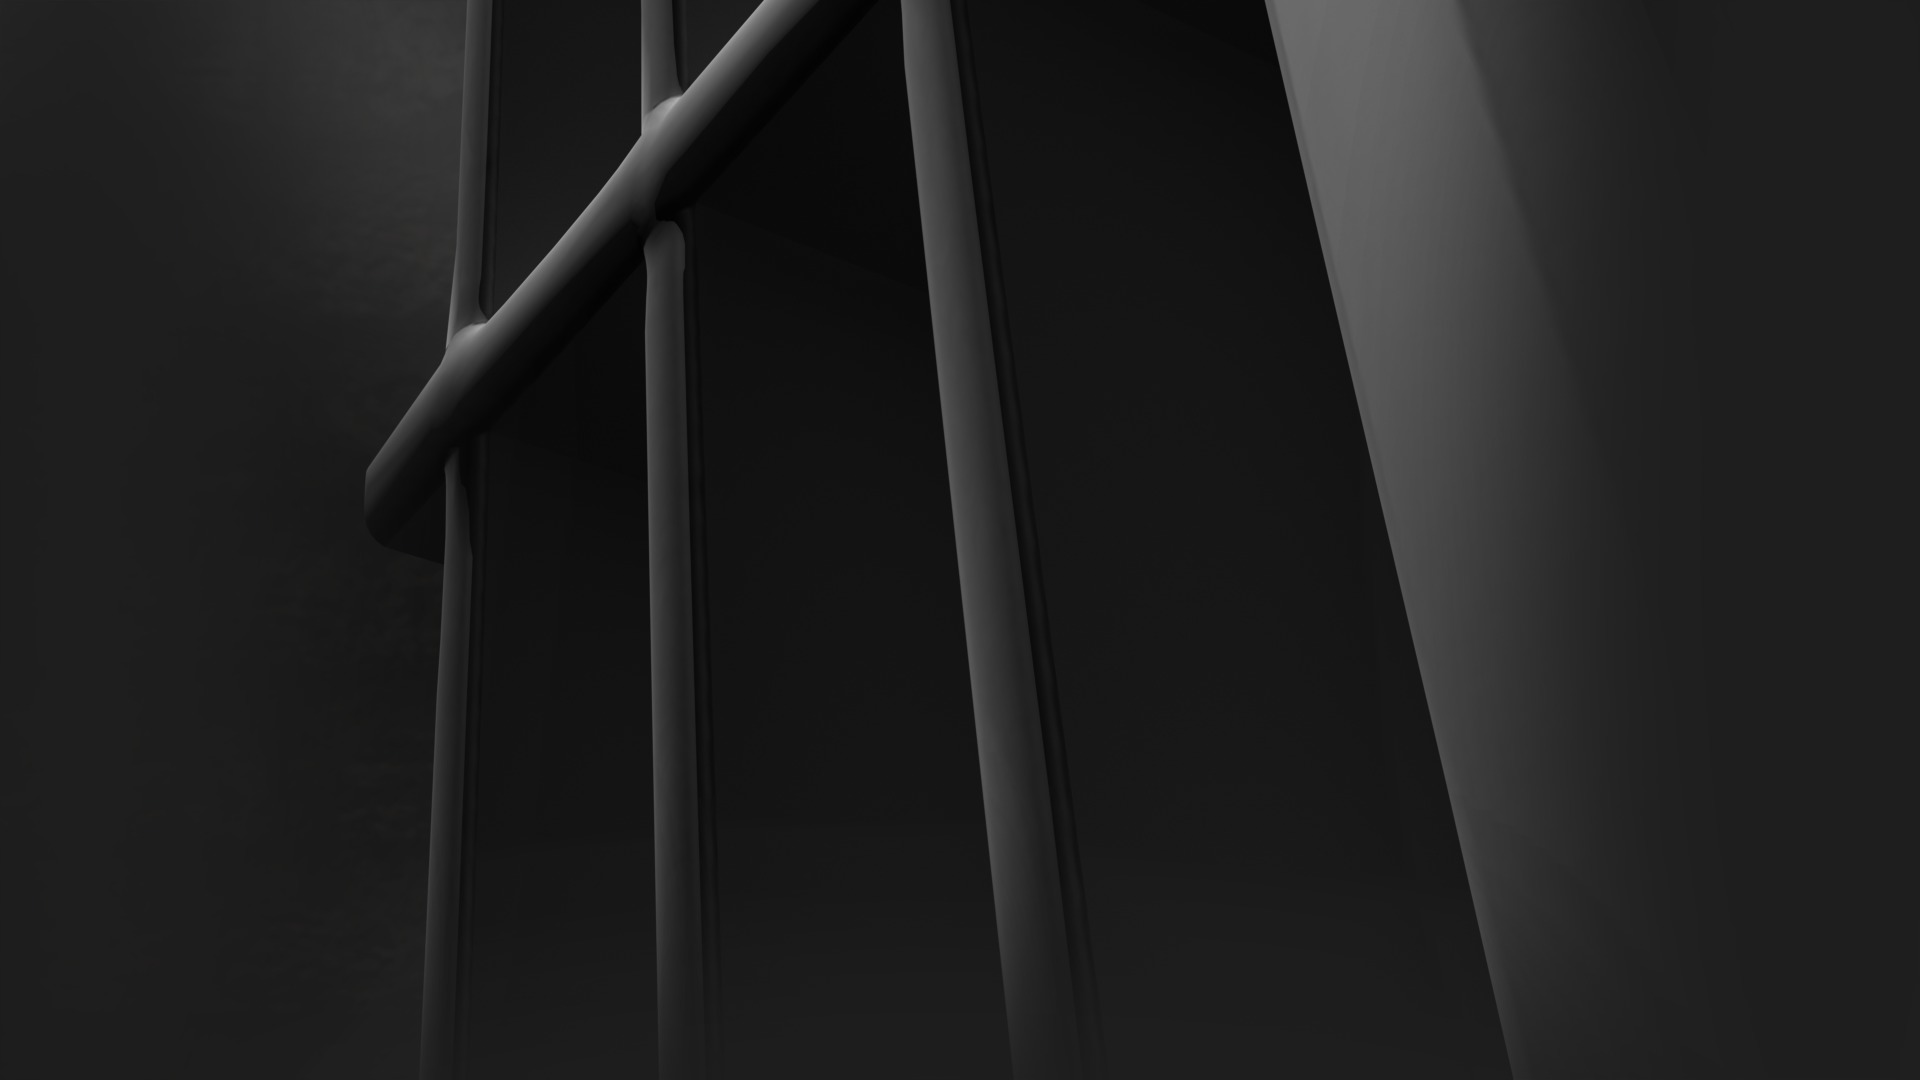 prison jail bars generic_233780